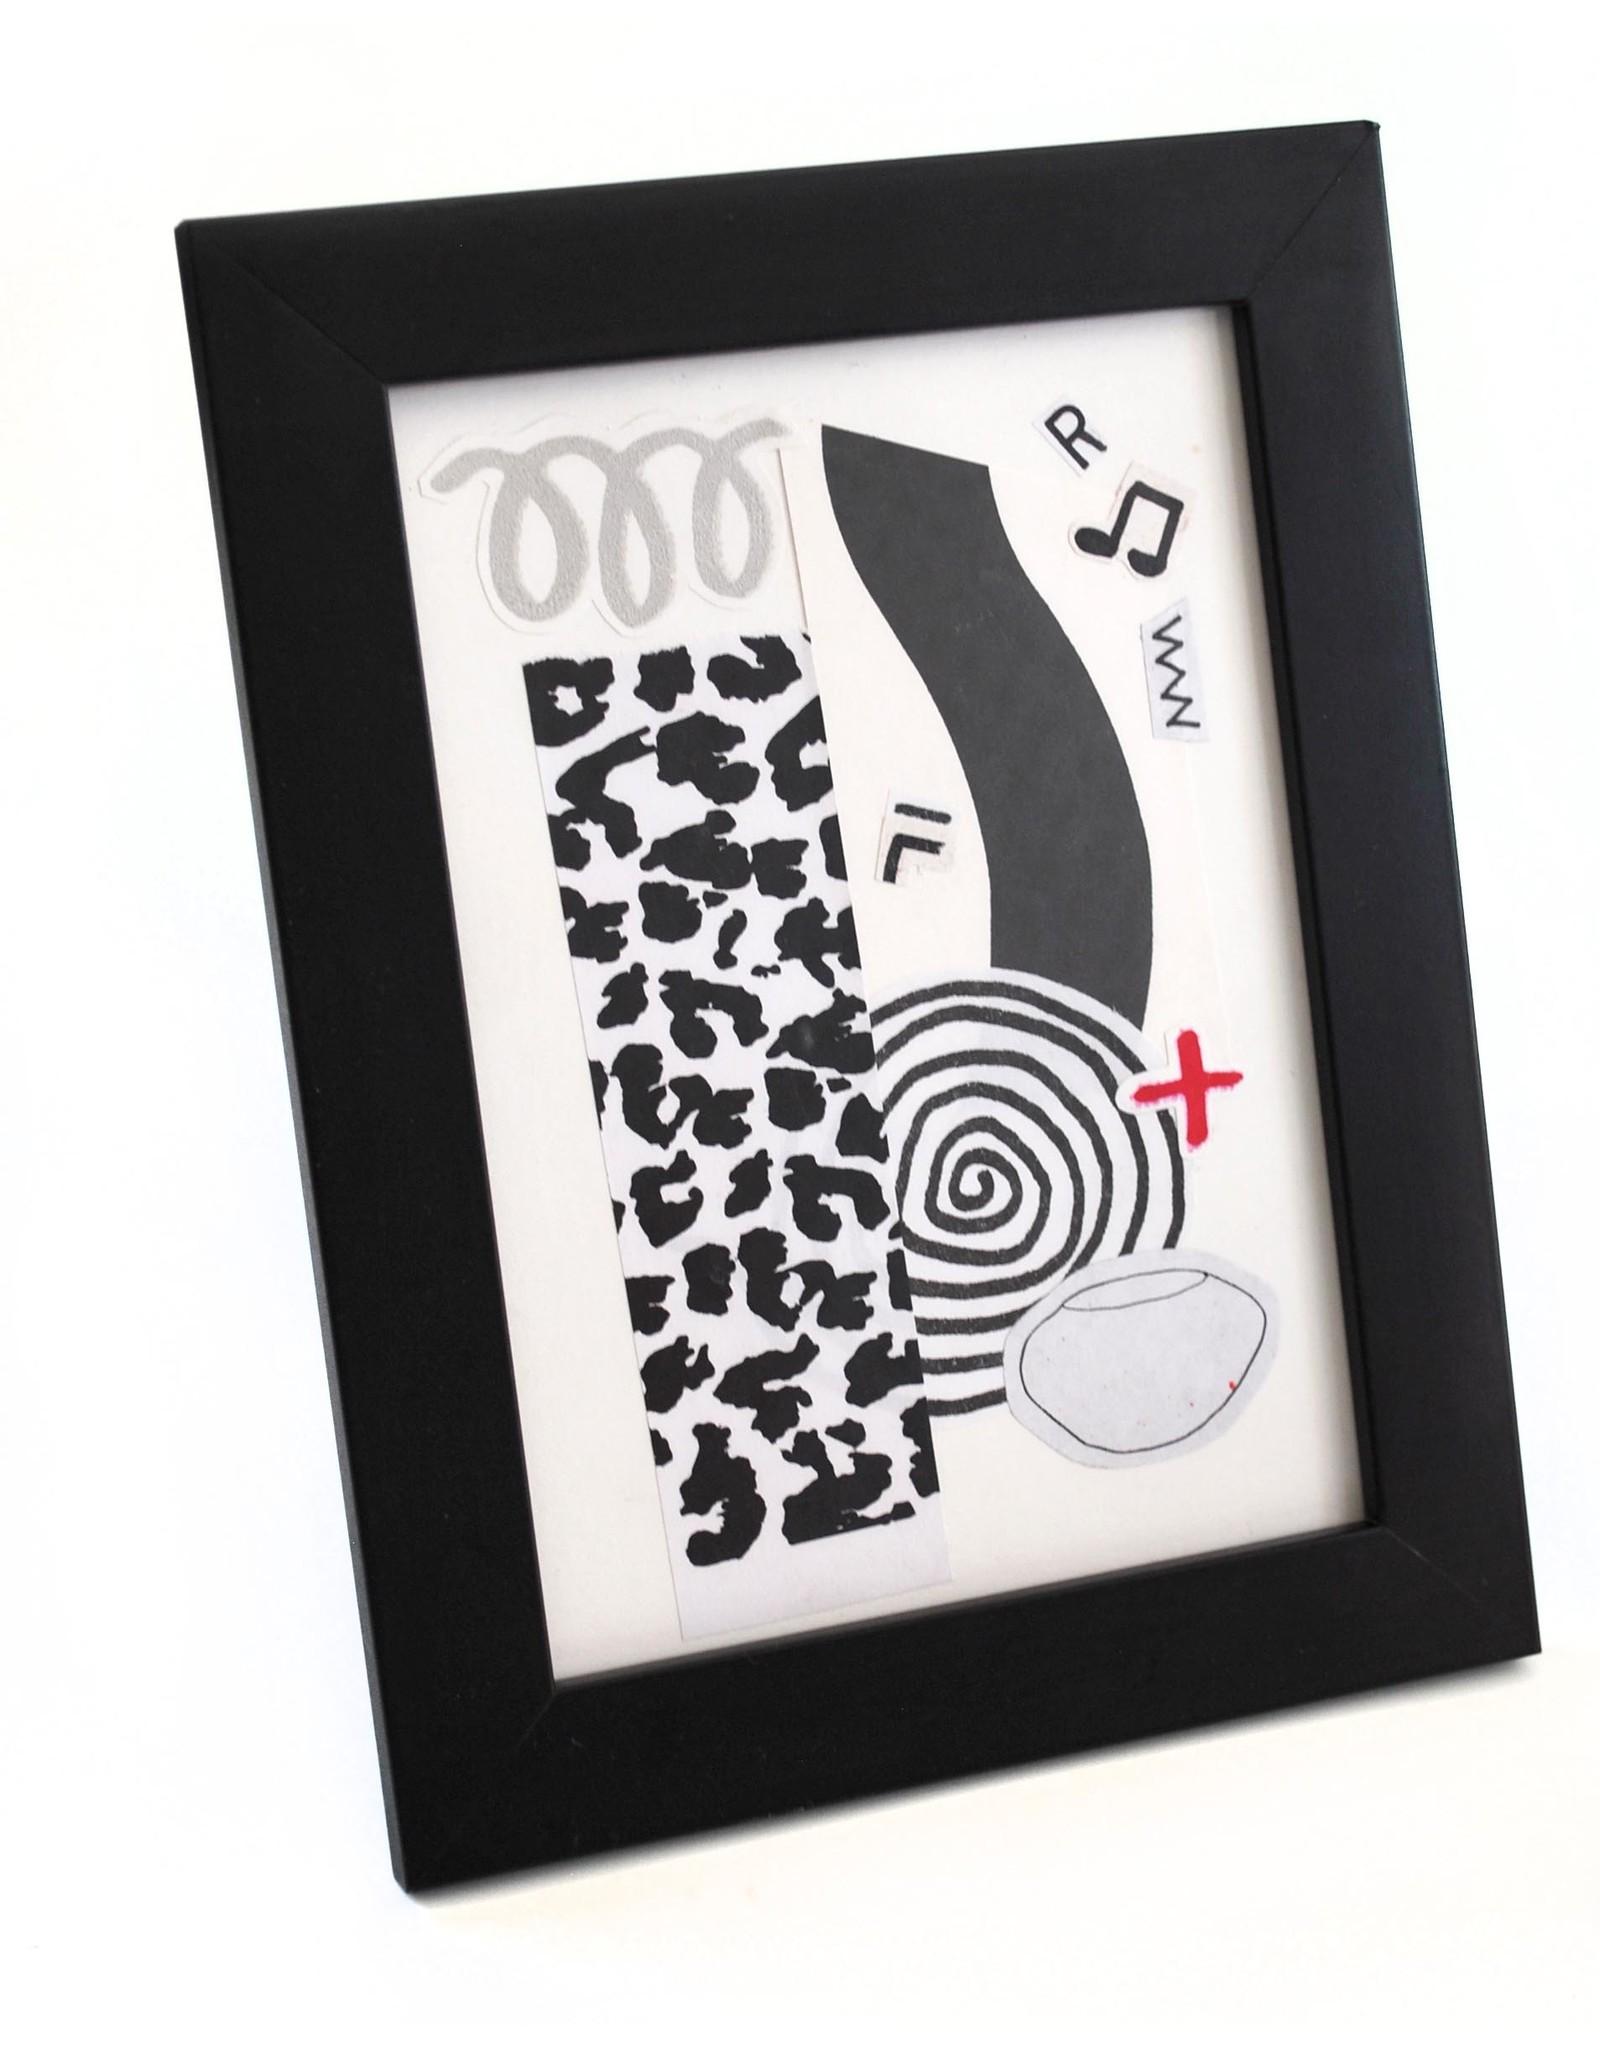 Julia Arredondo Quarantine Party, framed collage by Julia Arredondo